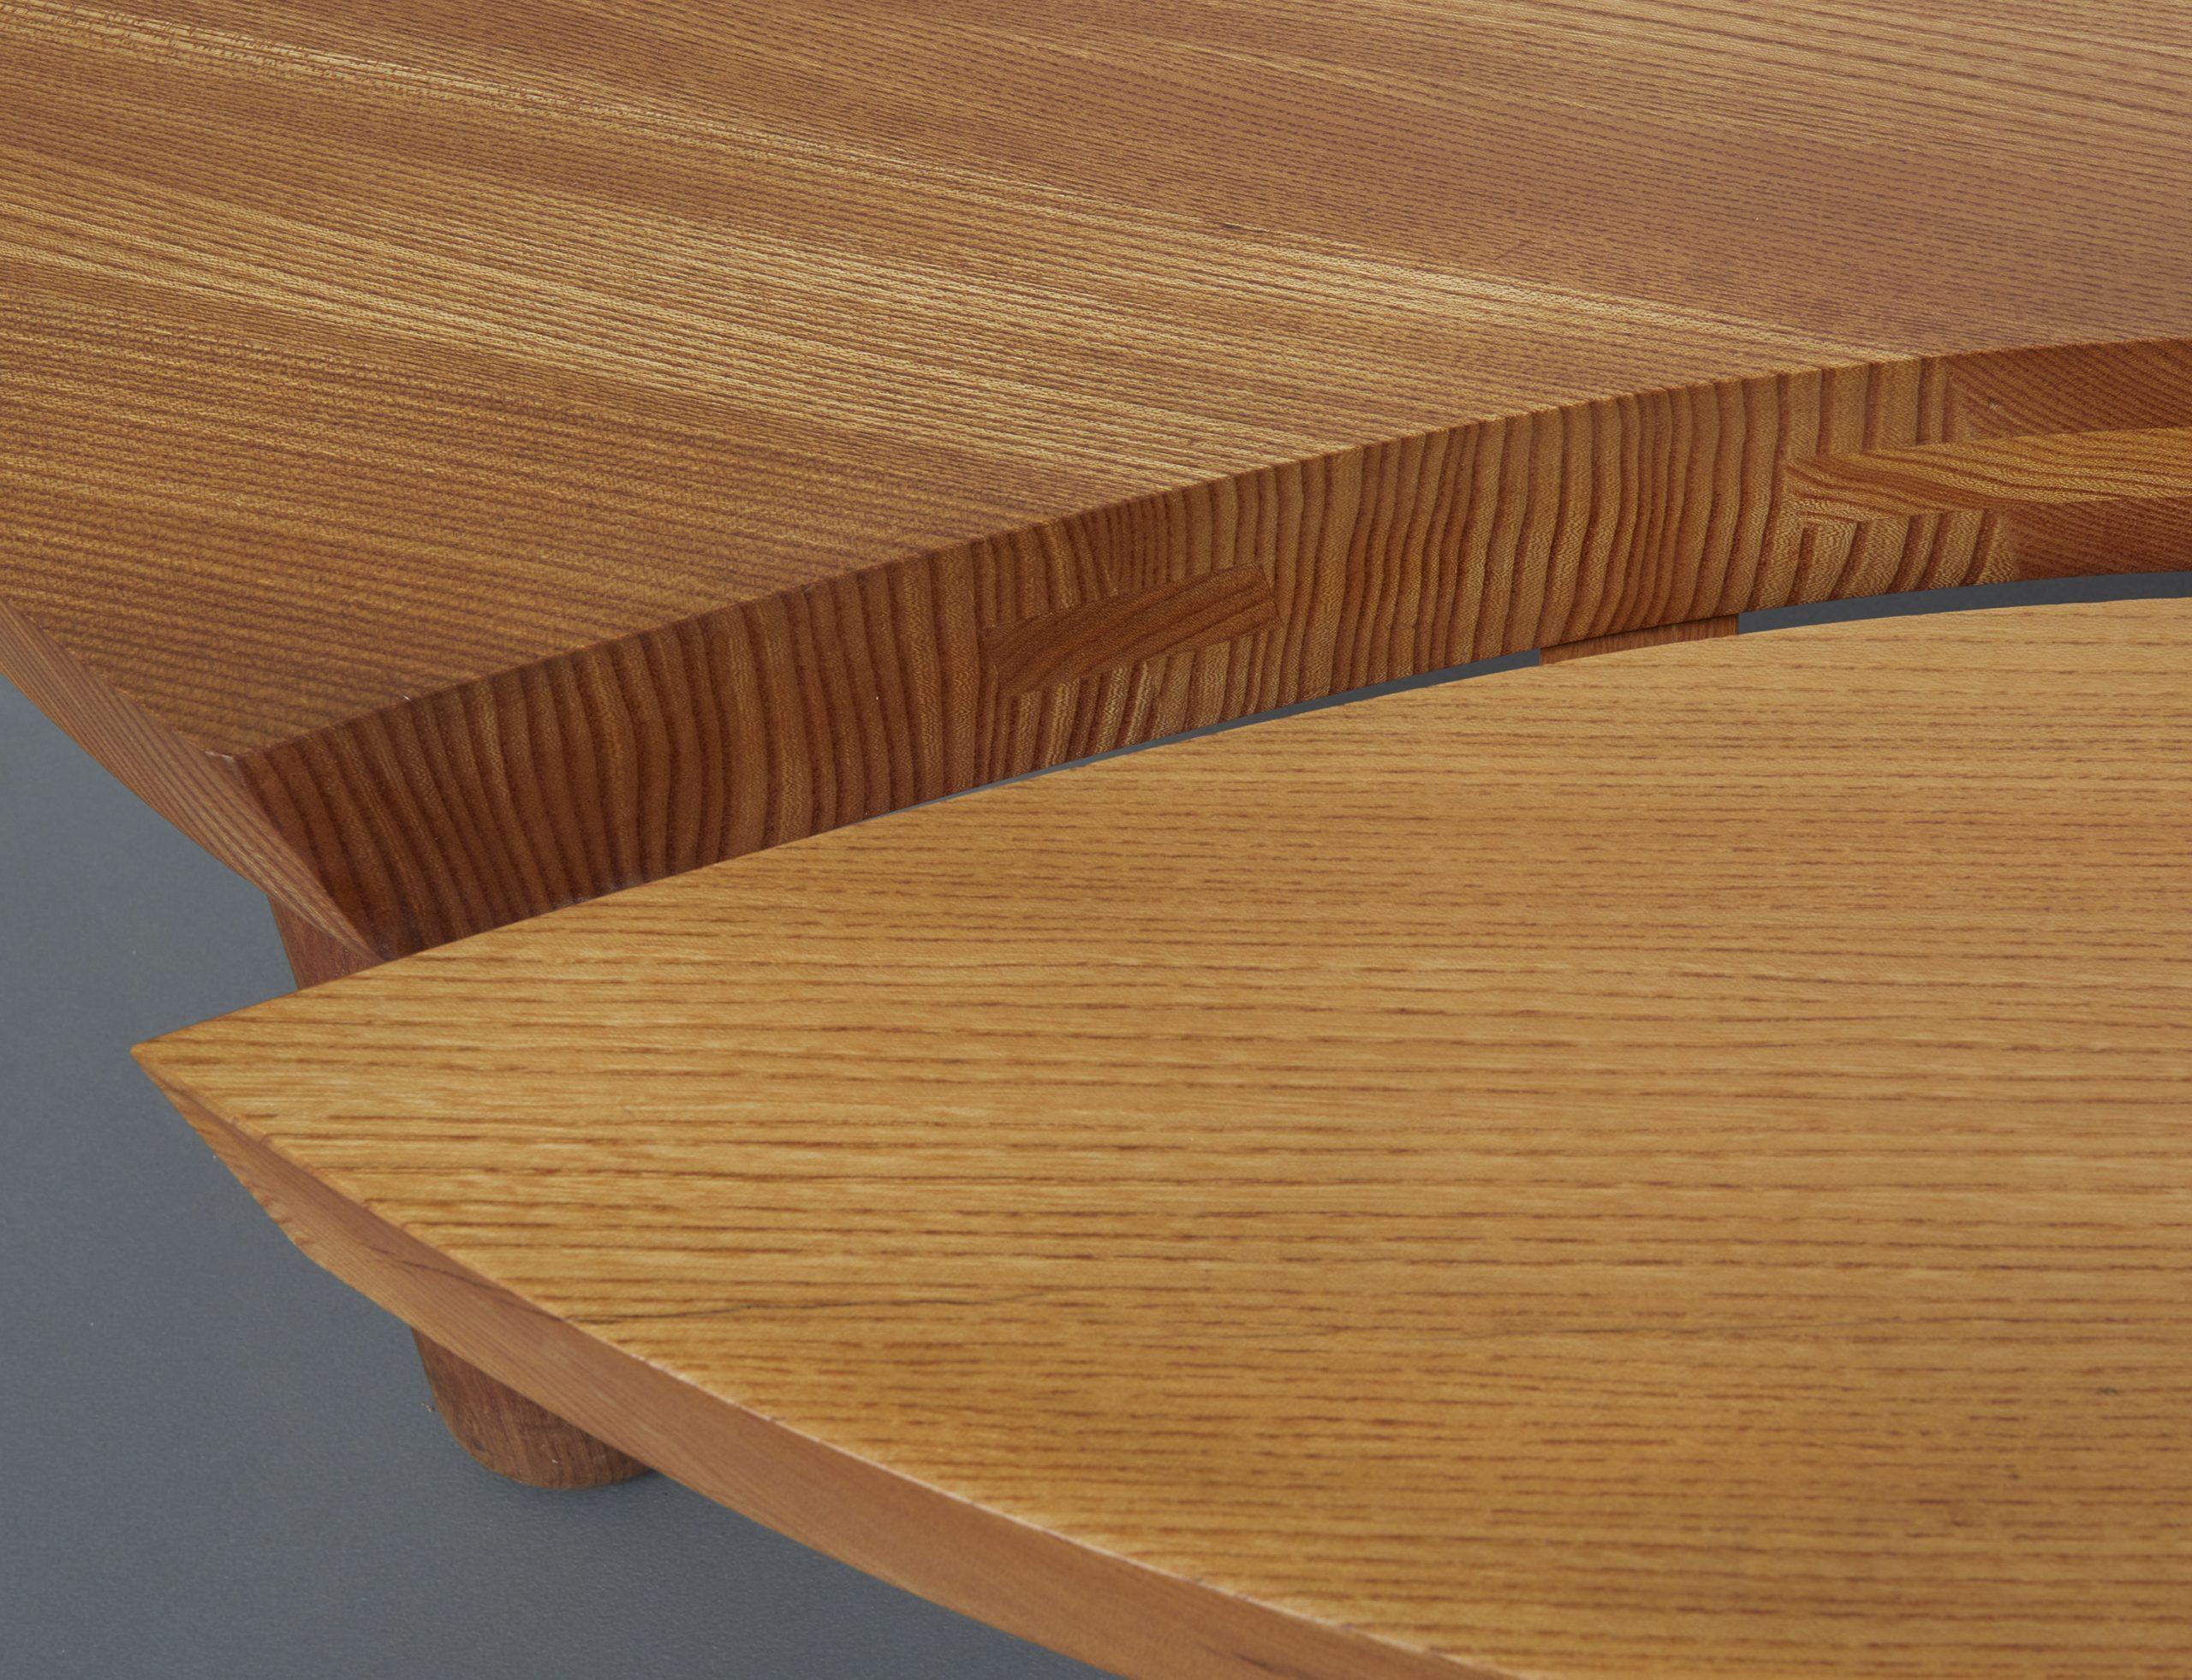 single-elmwood-low-table-t22-by-pierre-chapo-image-06